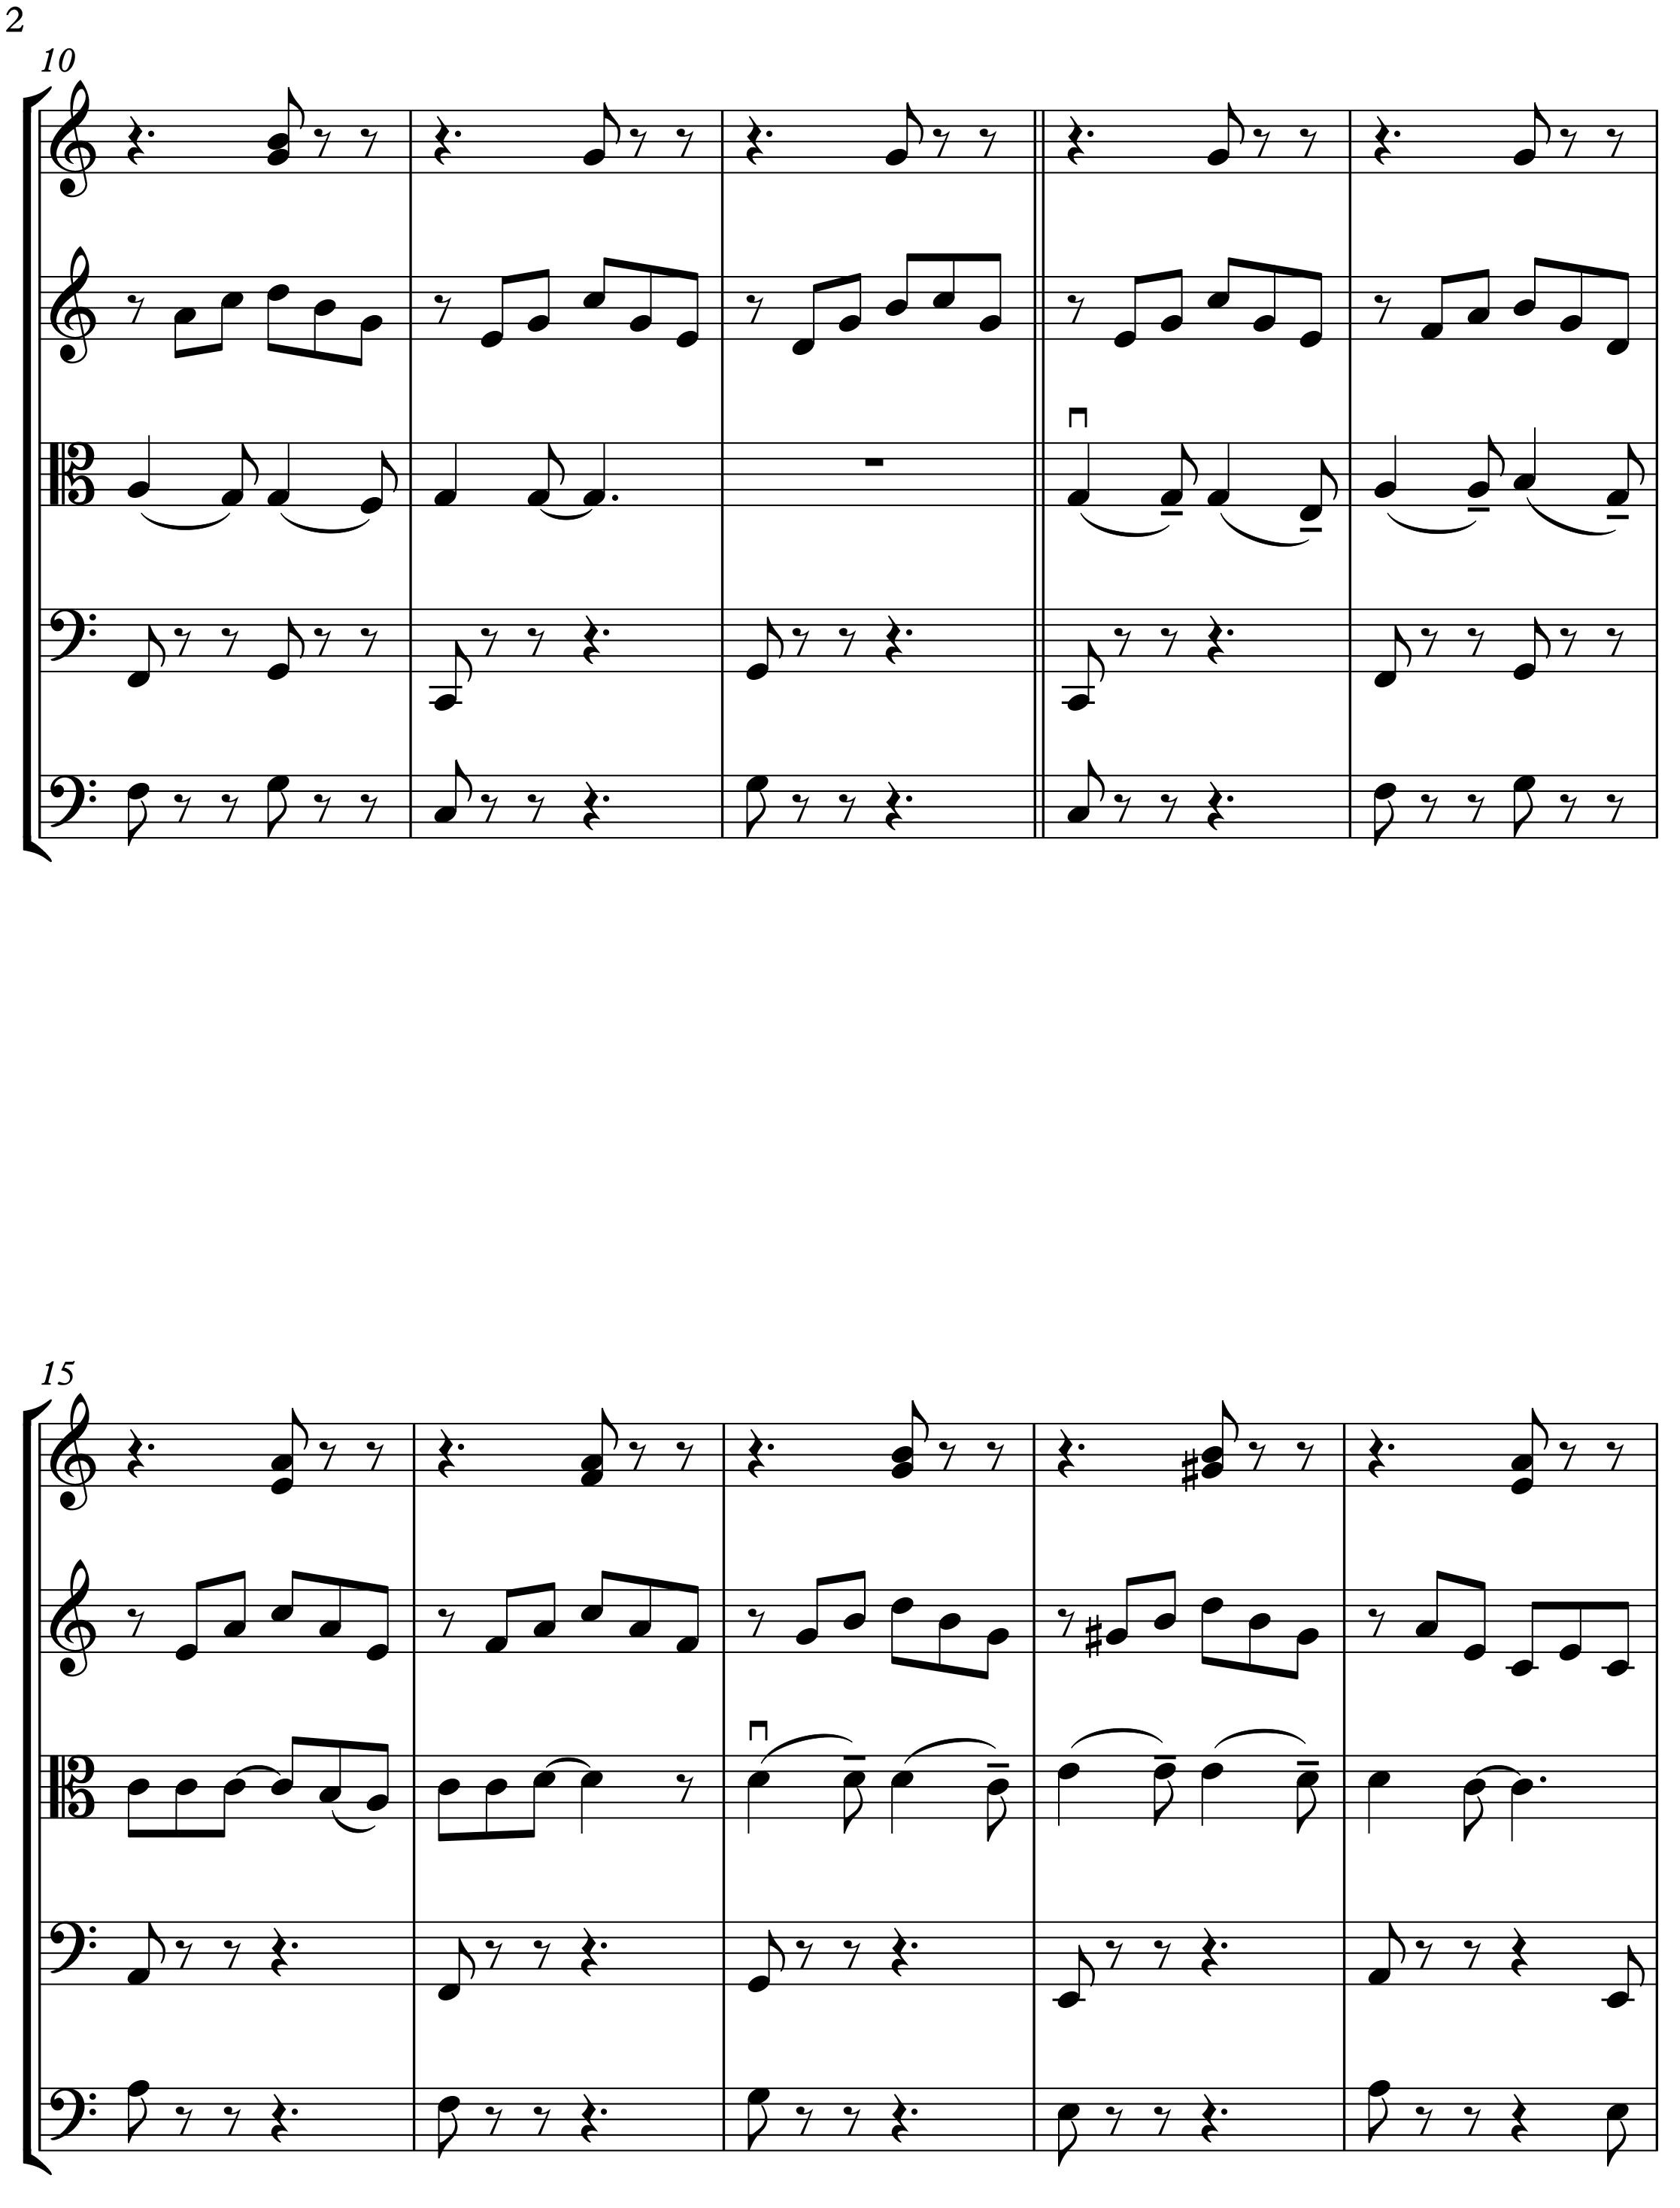 Hallelujah - Full Score-2.jpg